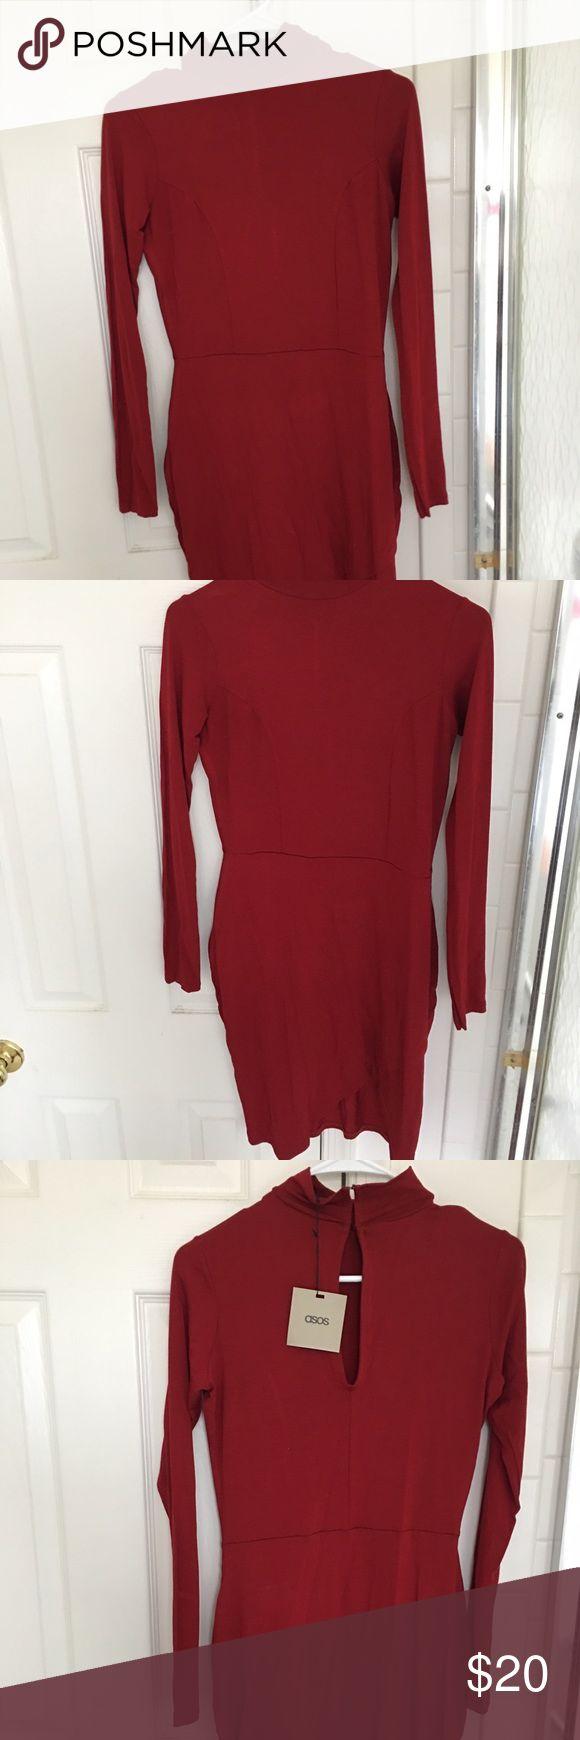 Asos red dress US size 4-6 ASOS Dresses Mini